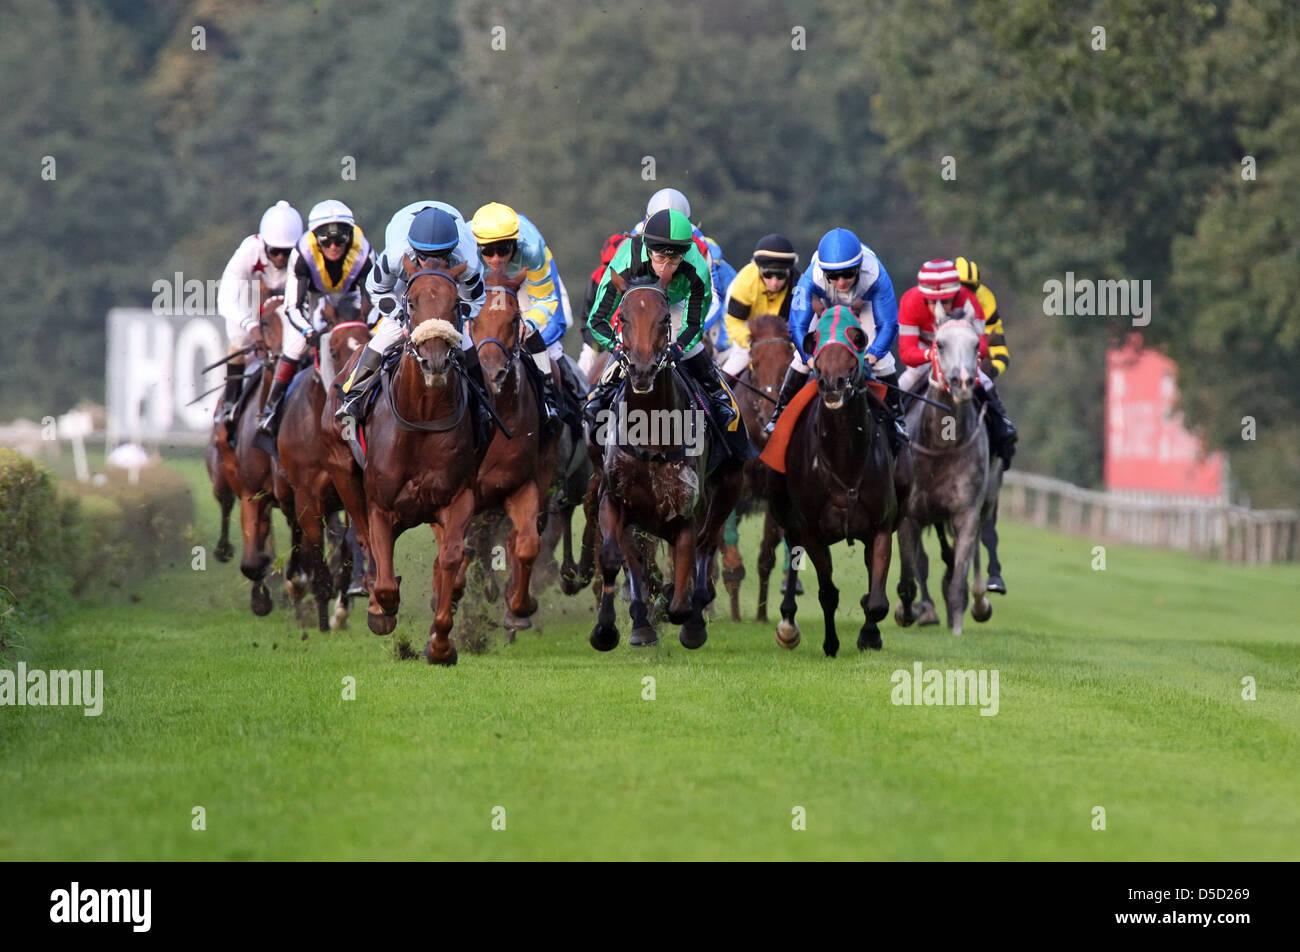 Hoppegarten, Germany, horses and jockeys during one horse race - Stock Image